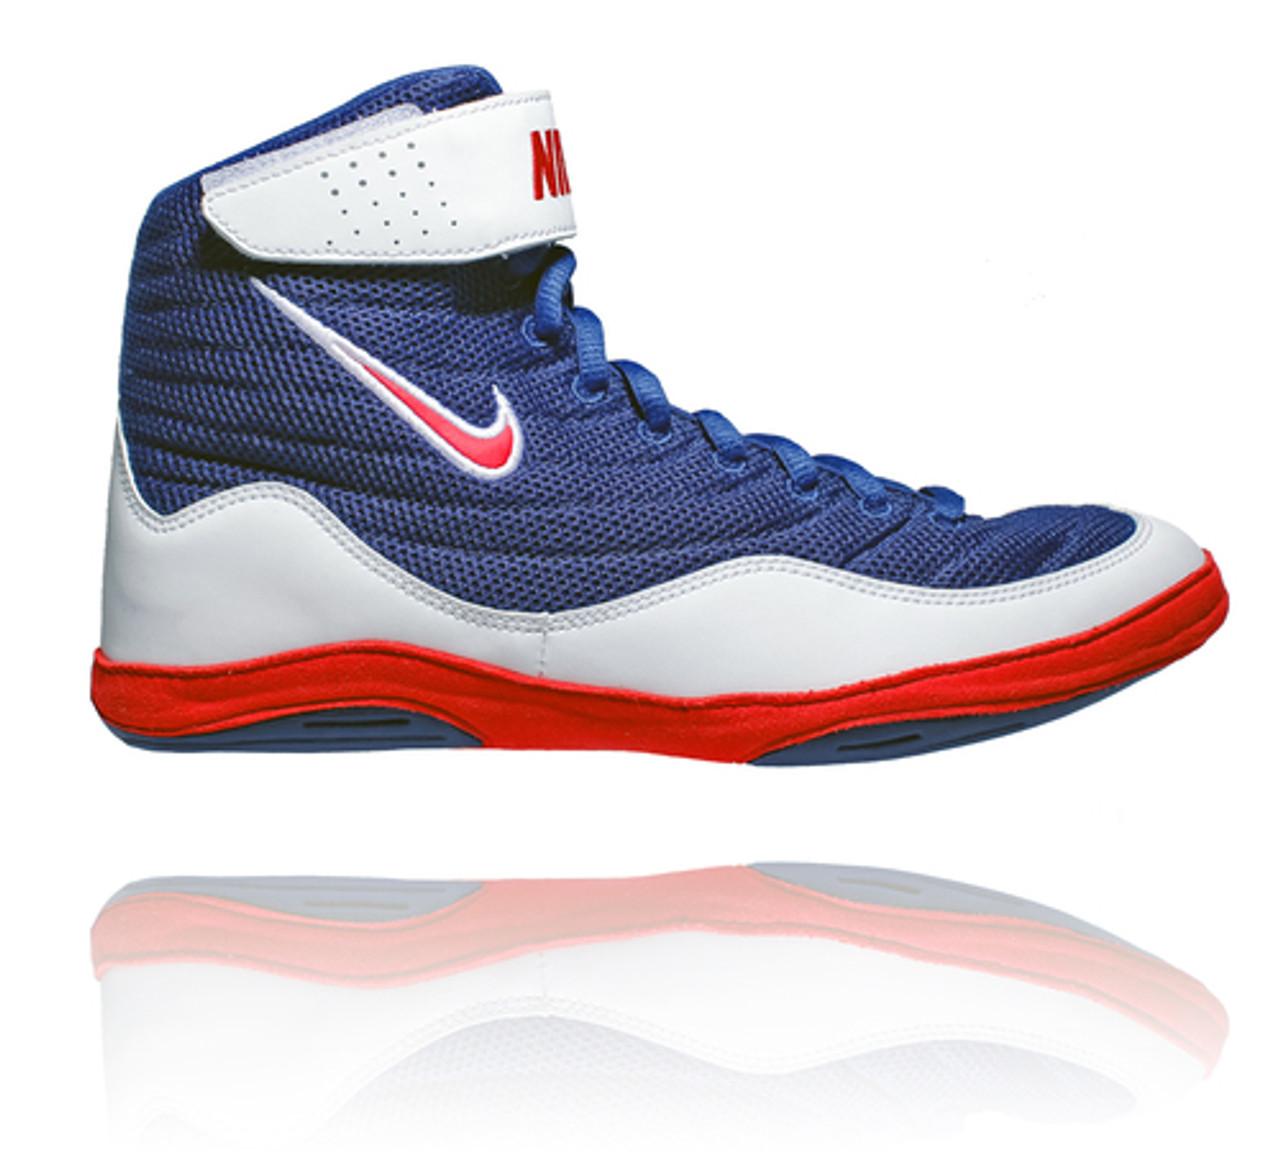 Nike Inflict 3 - Deep Royal